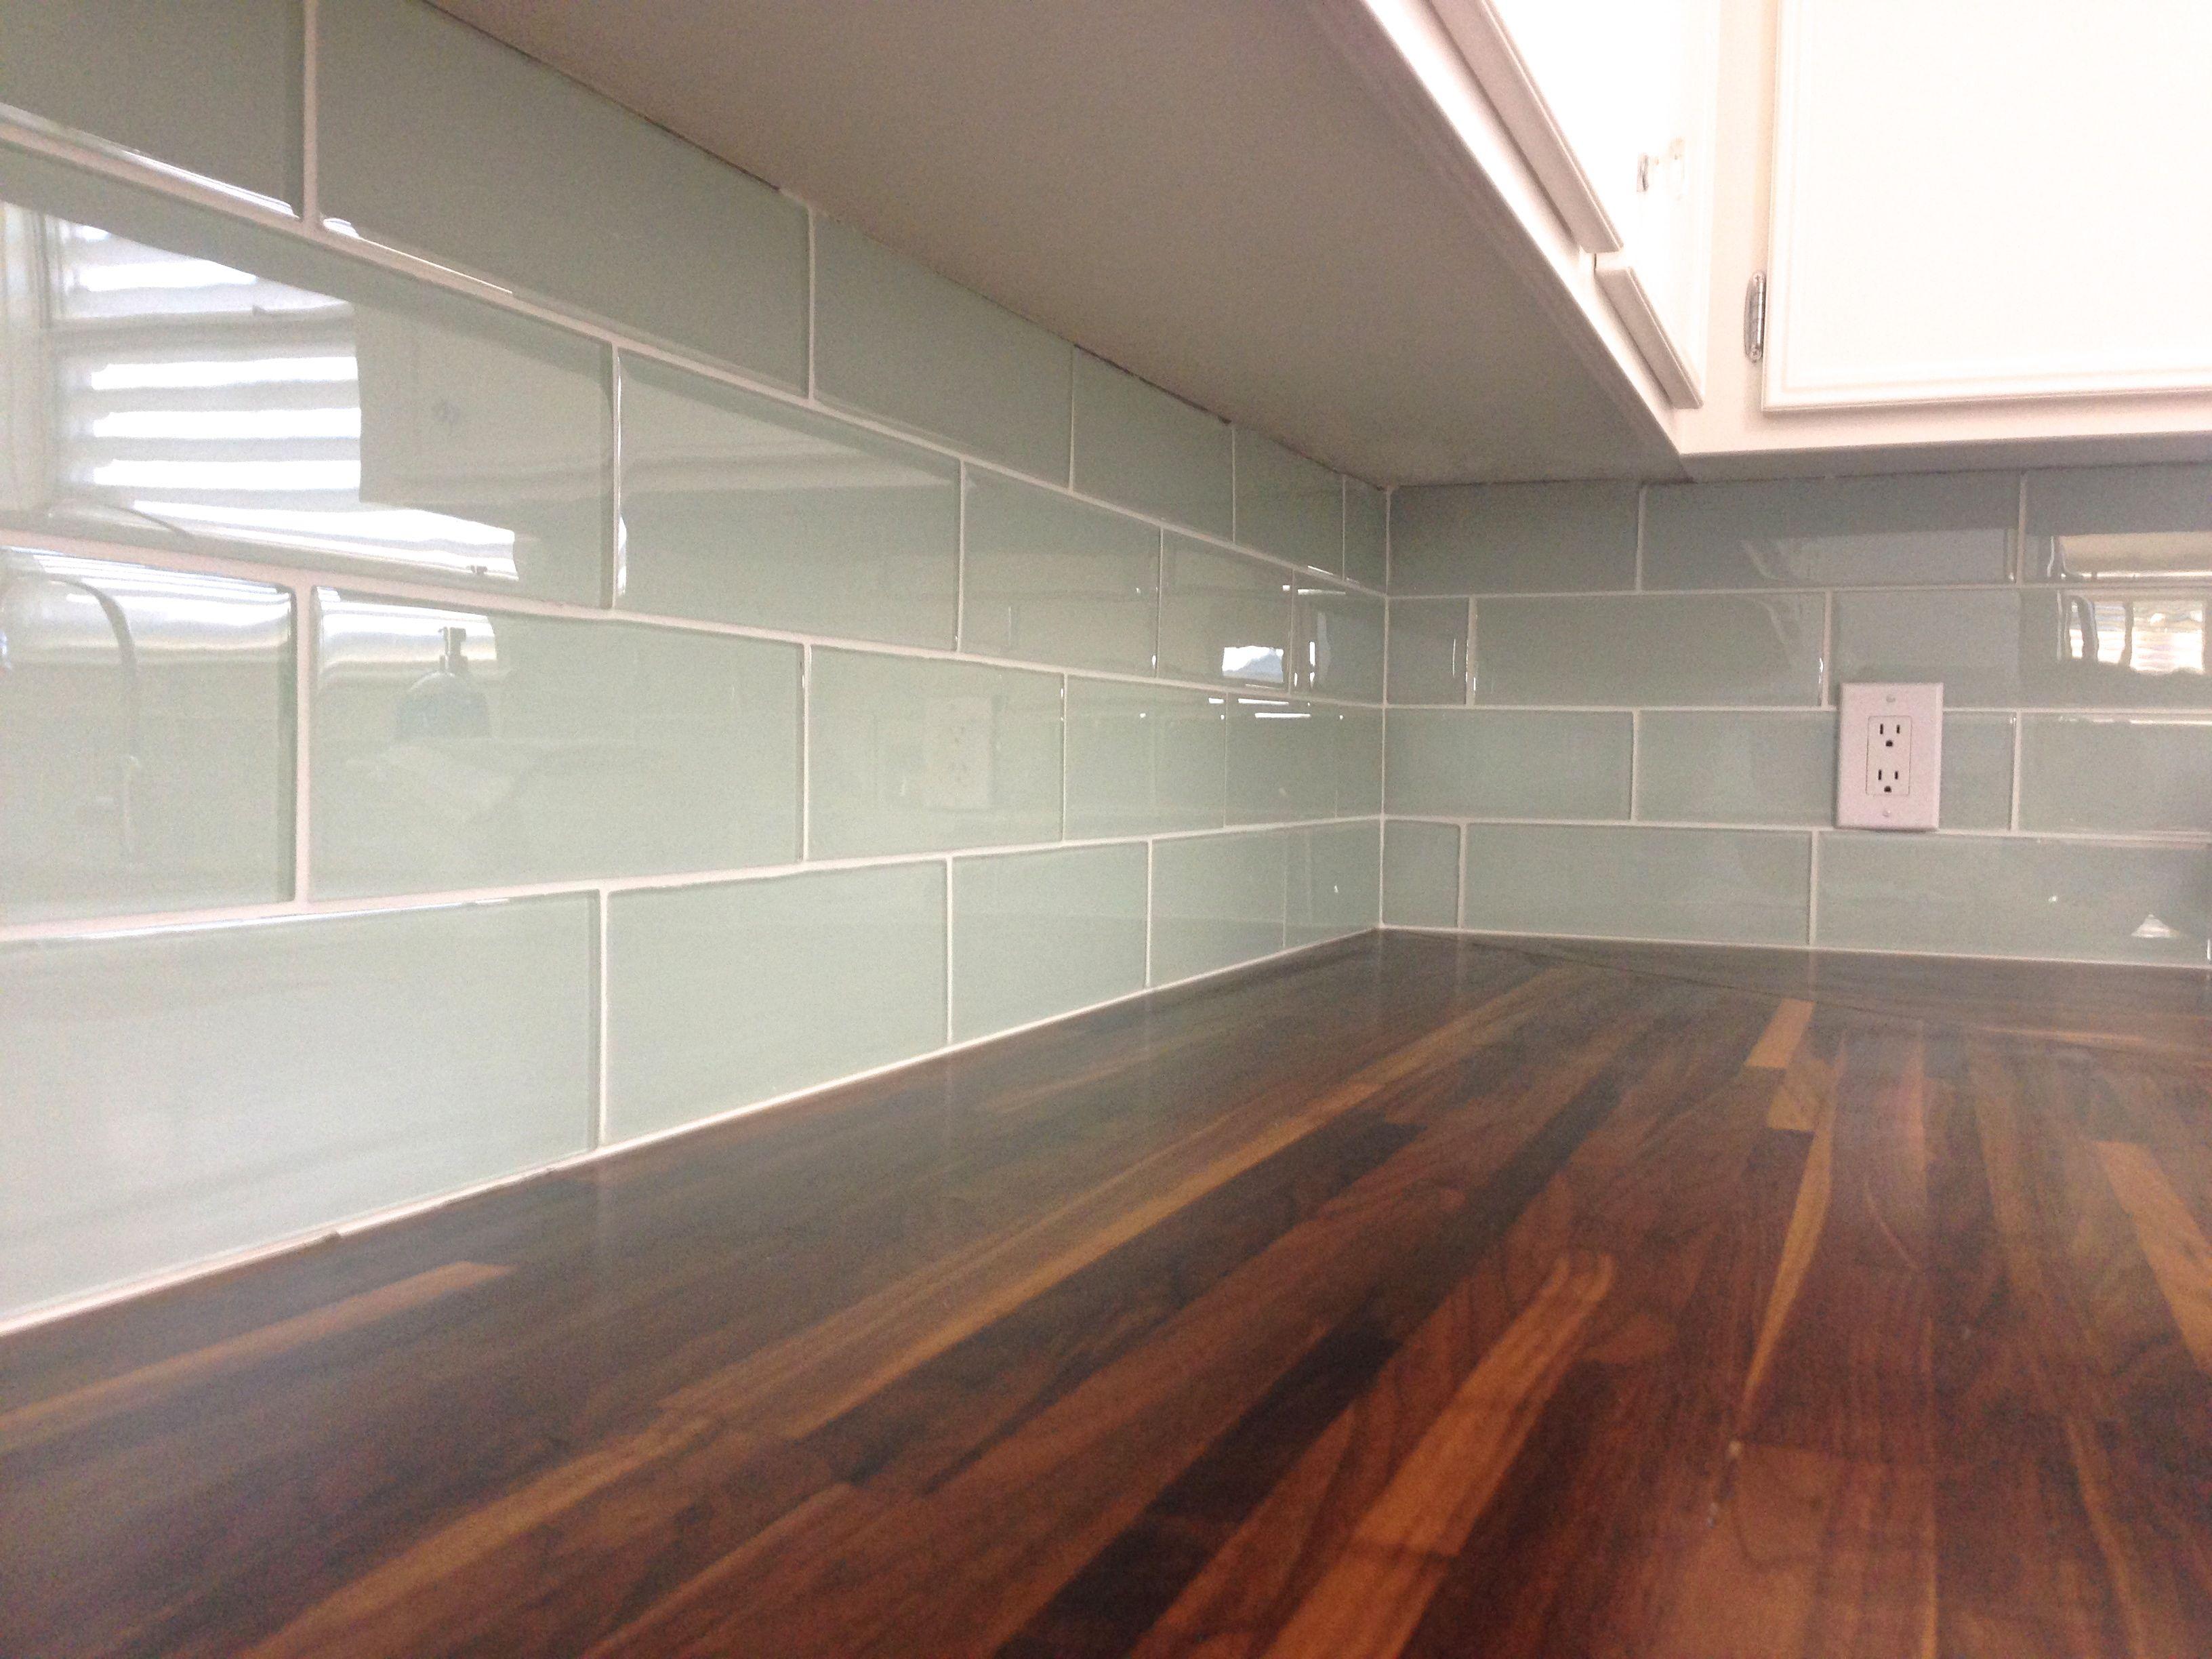 diy glass tile backsplash tips from fisherman 39 s wife furniture